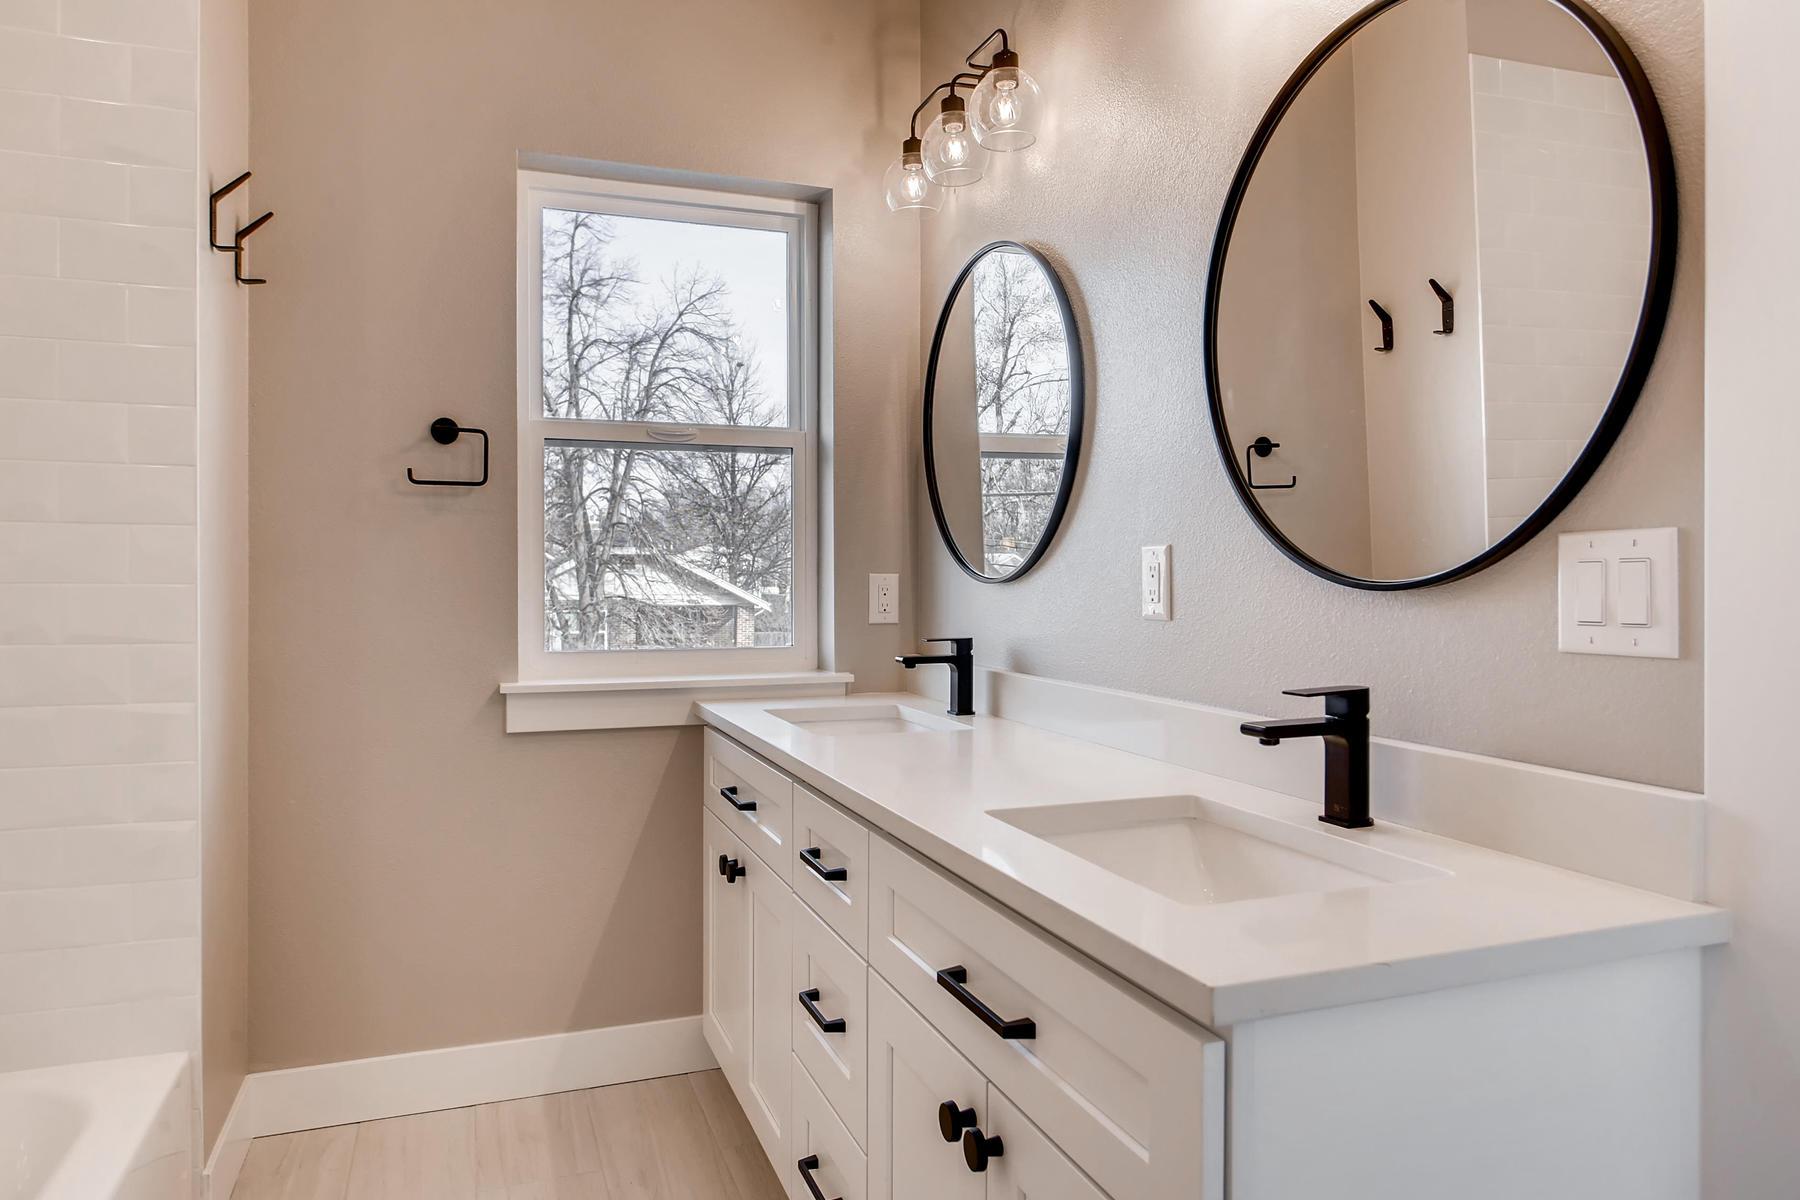 3101 S Cherokee St Englewood-018-18-2nd Floor Master Bathroom-MLS_Size.jpg